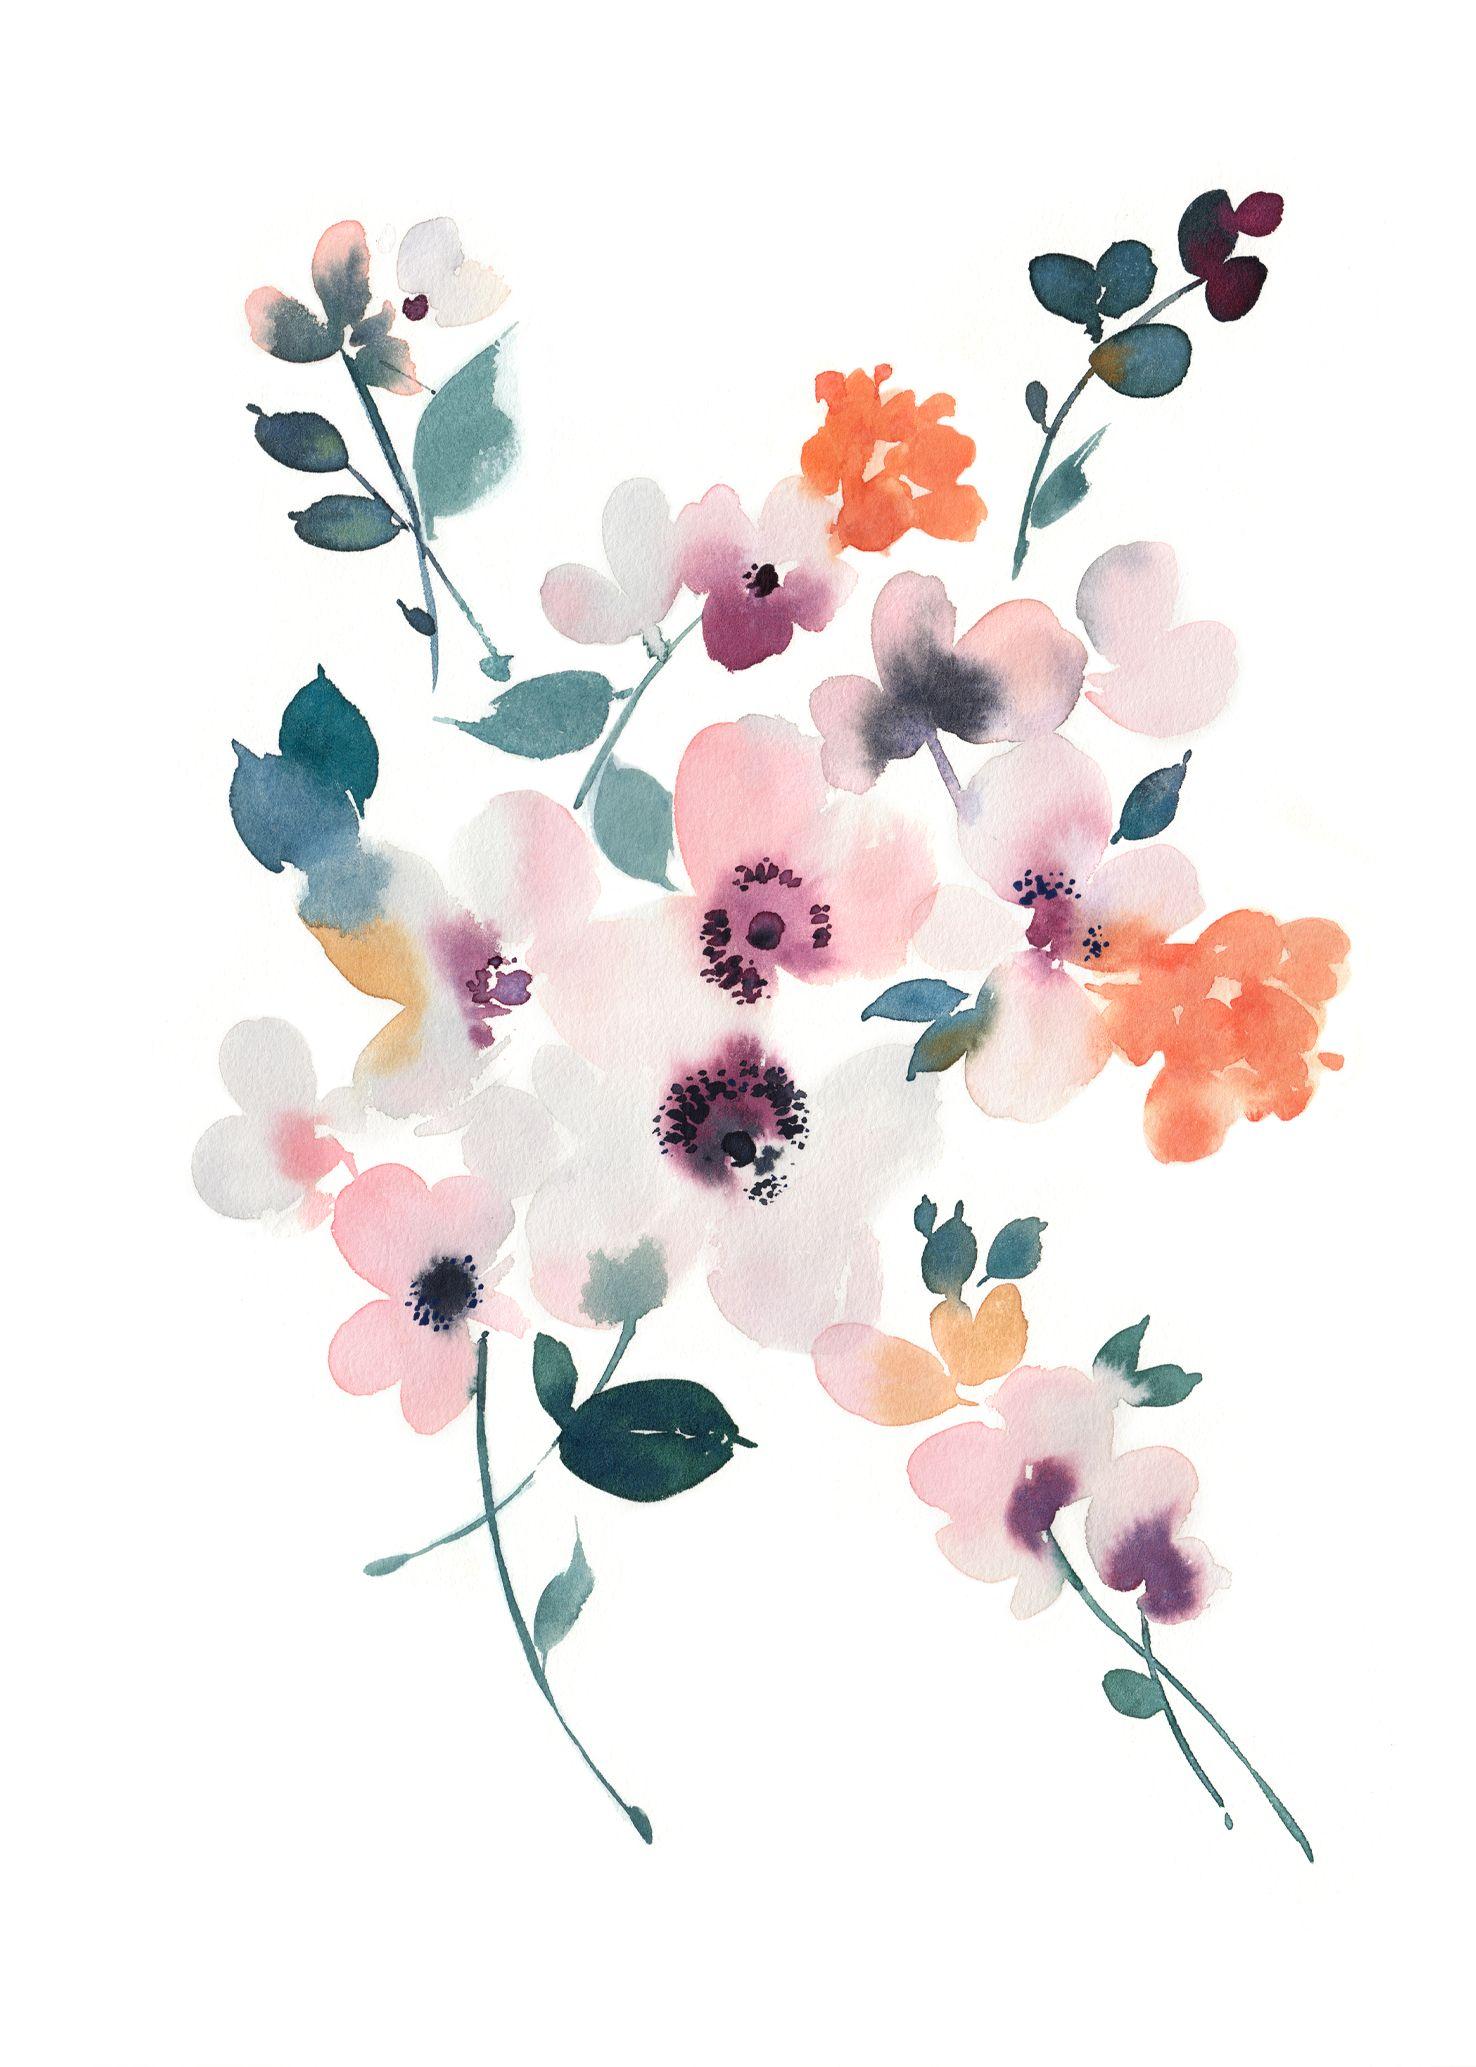 Abstract Watercolor Floral Wall Art Print Watercolor Flower Prints Watercolor Flowers Floral Watercolor